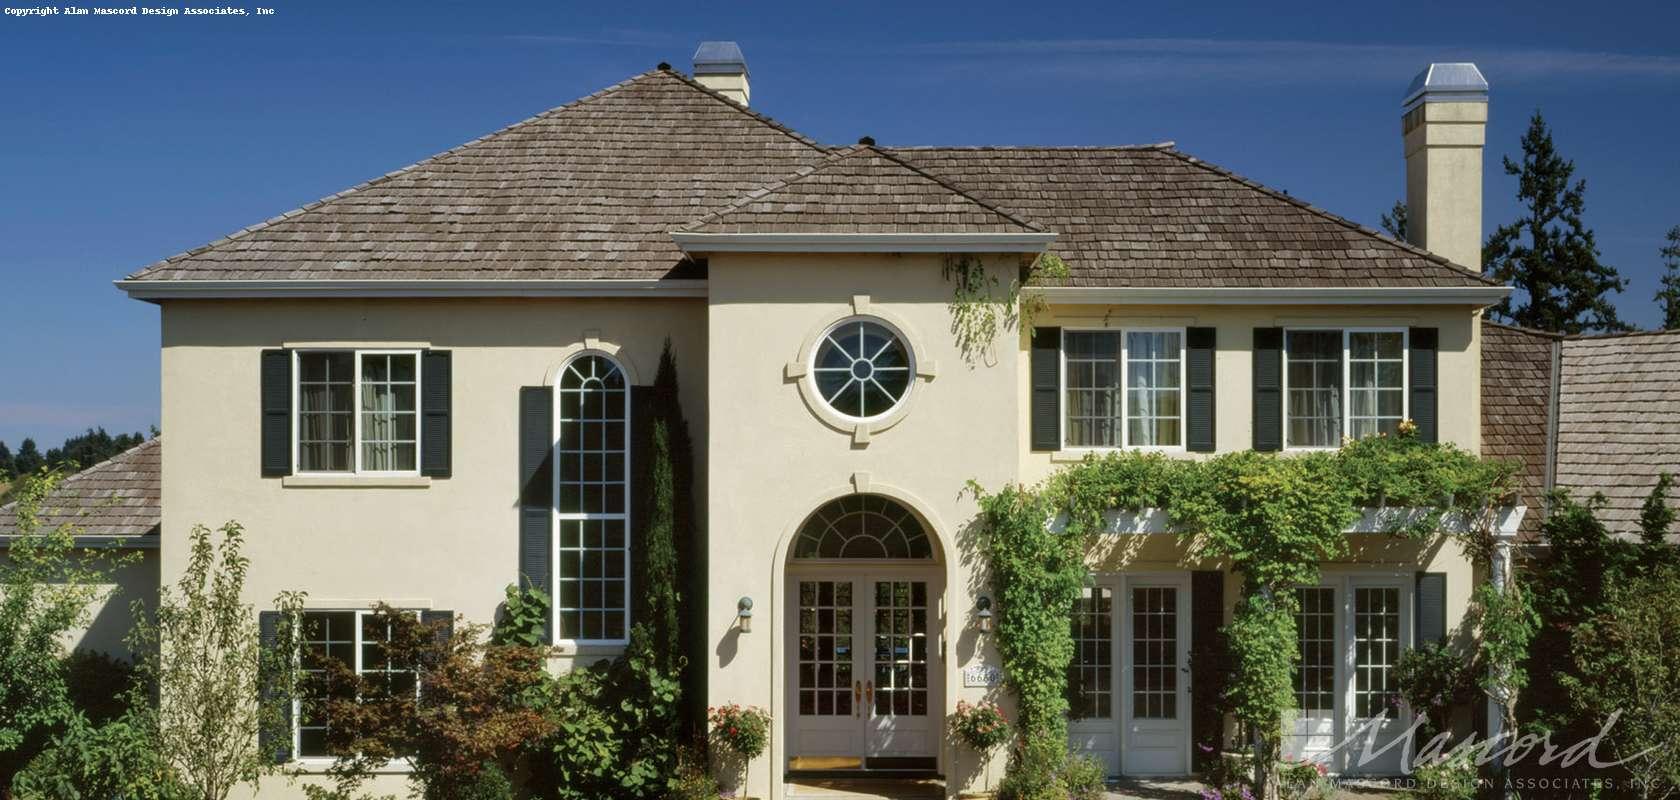 Mascord House Plan 2415: The Merino